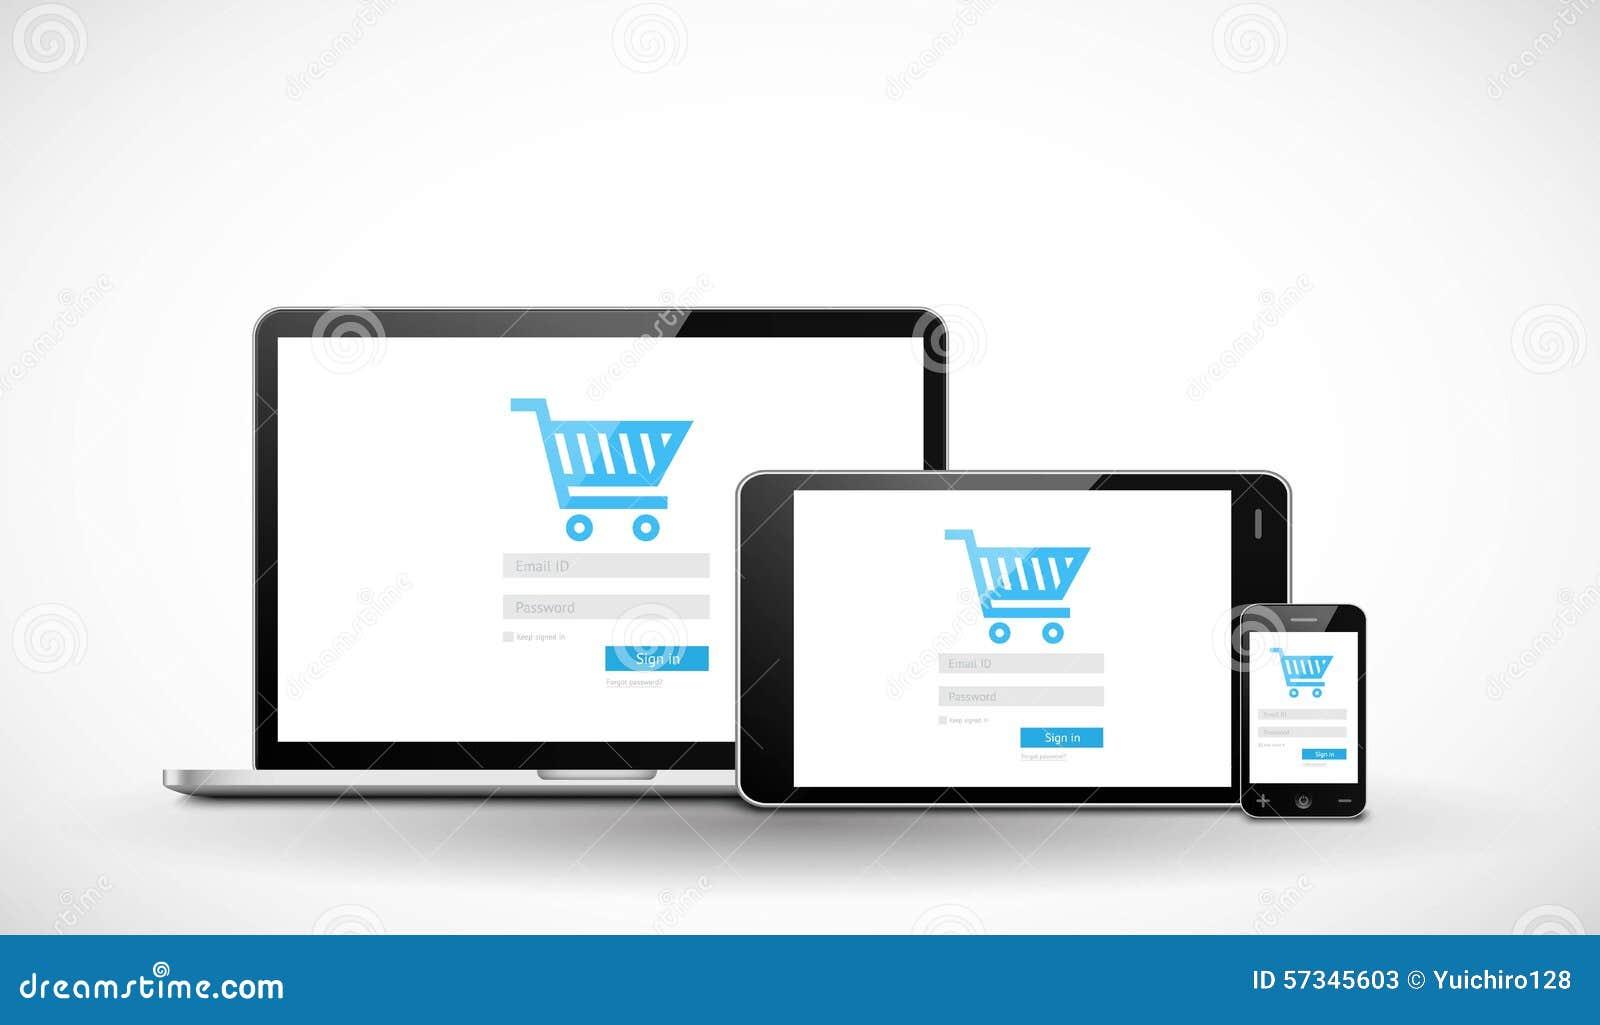 Responsive Web Template Stock Vector - Image: 58411497